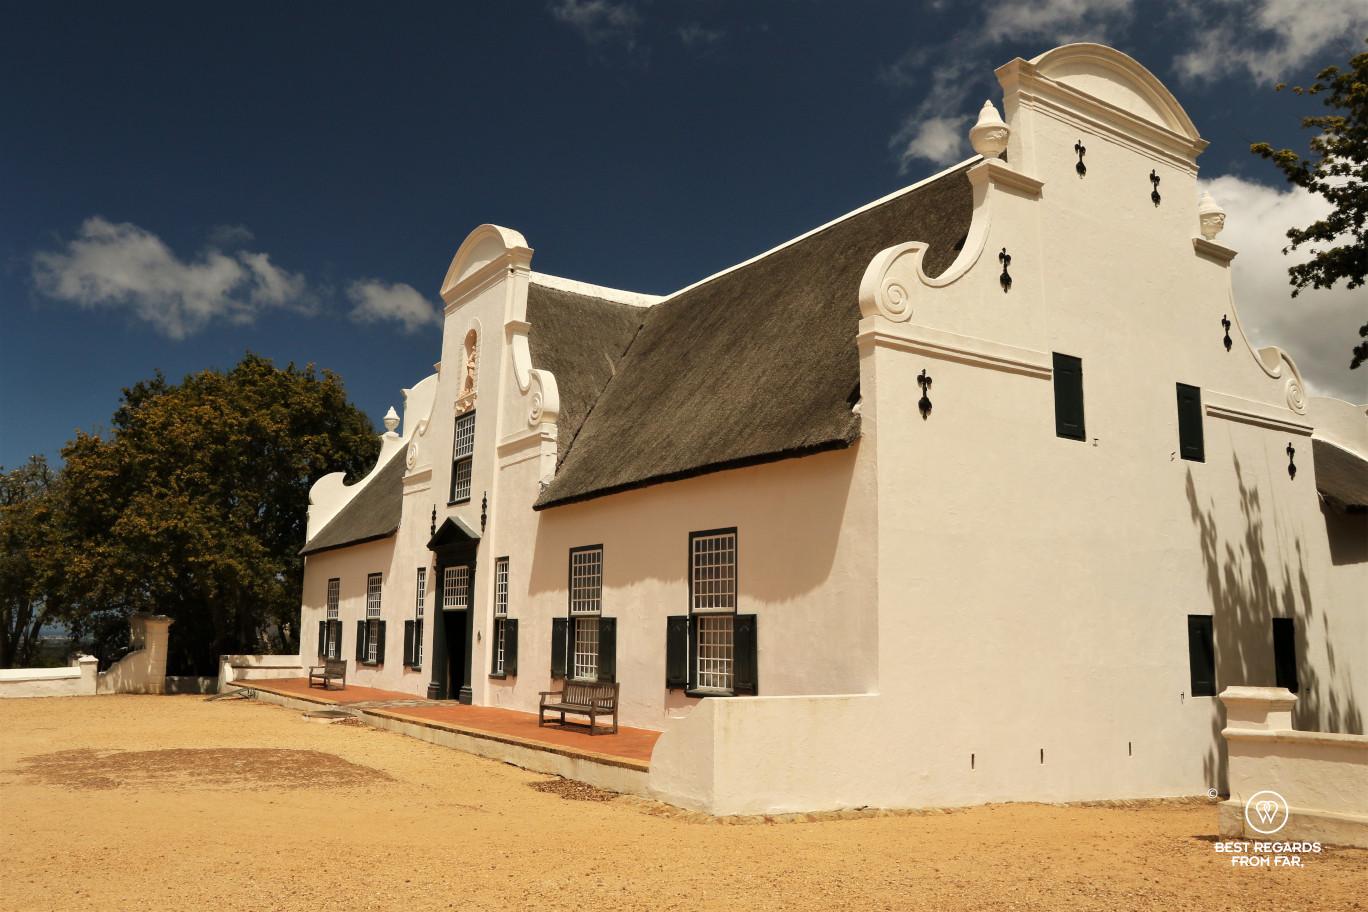 Groot Constantia wine domain with Cape Dutch manor, Constantia wine route, Cape Town